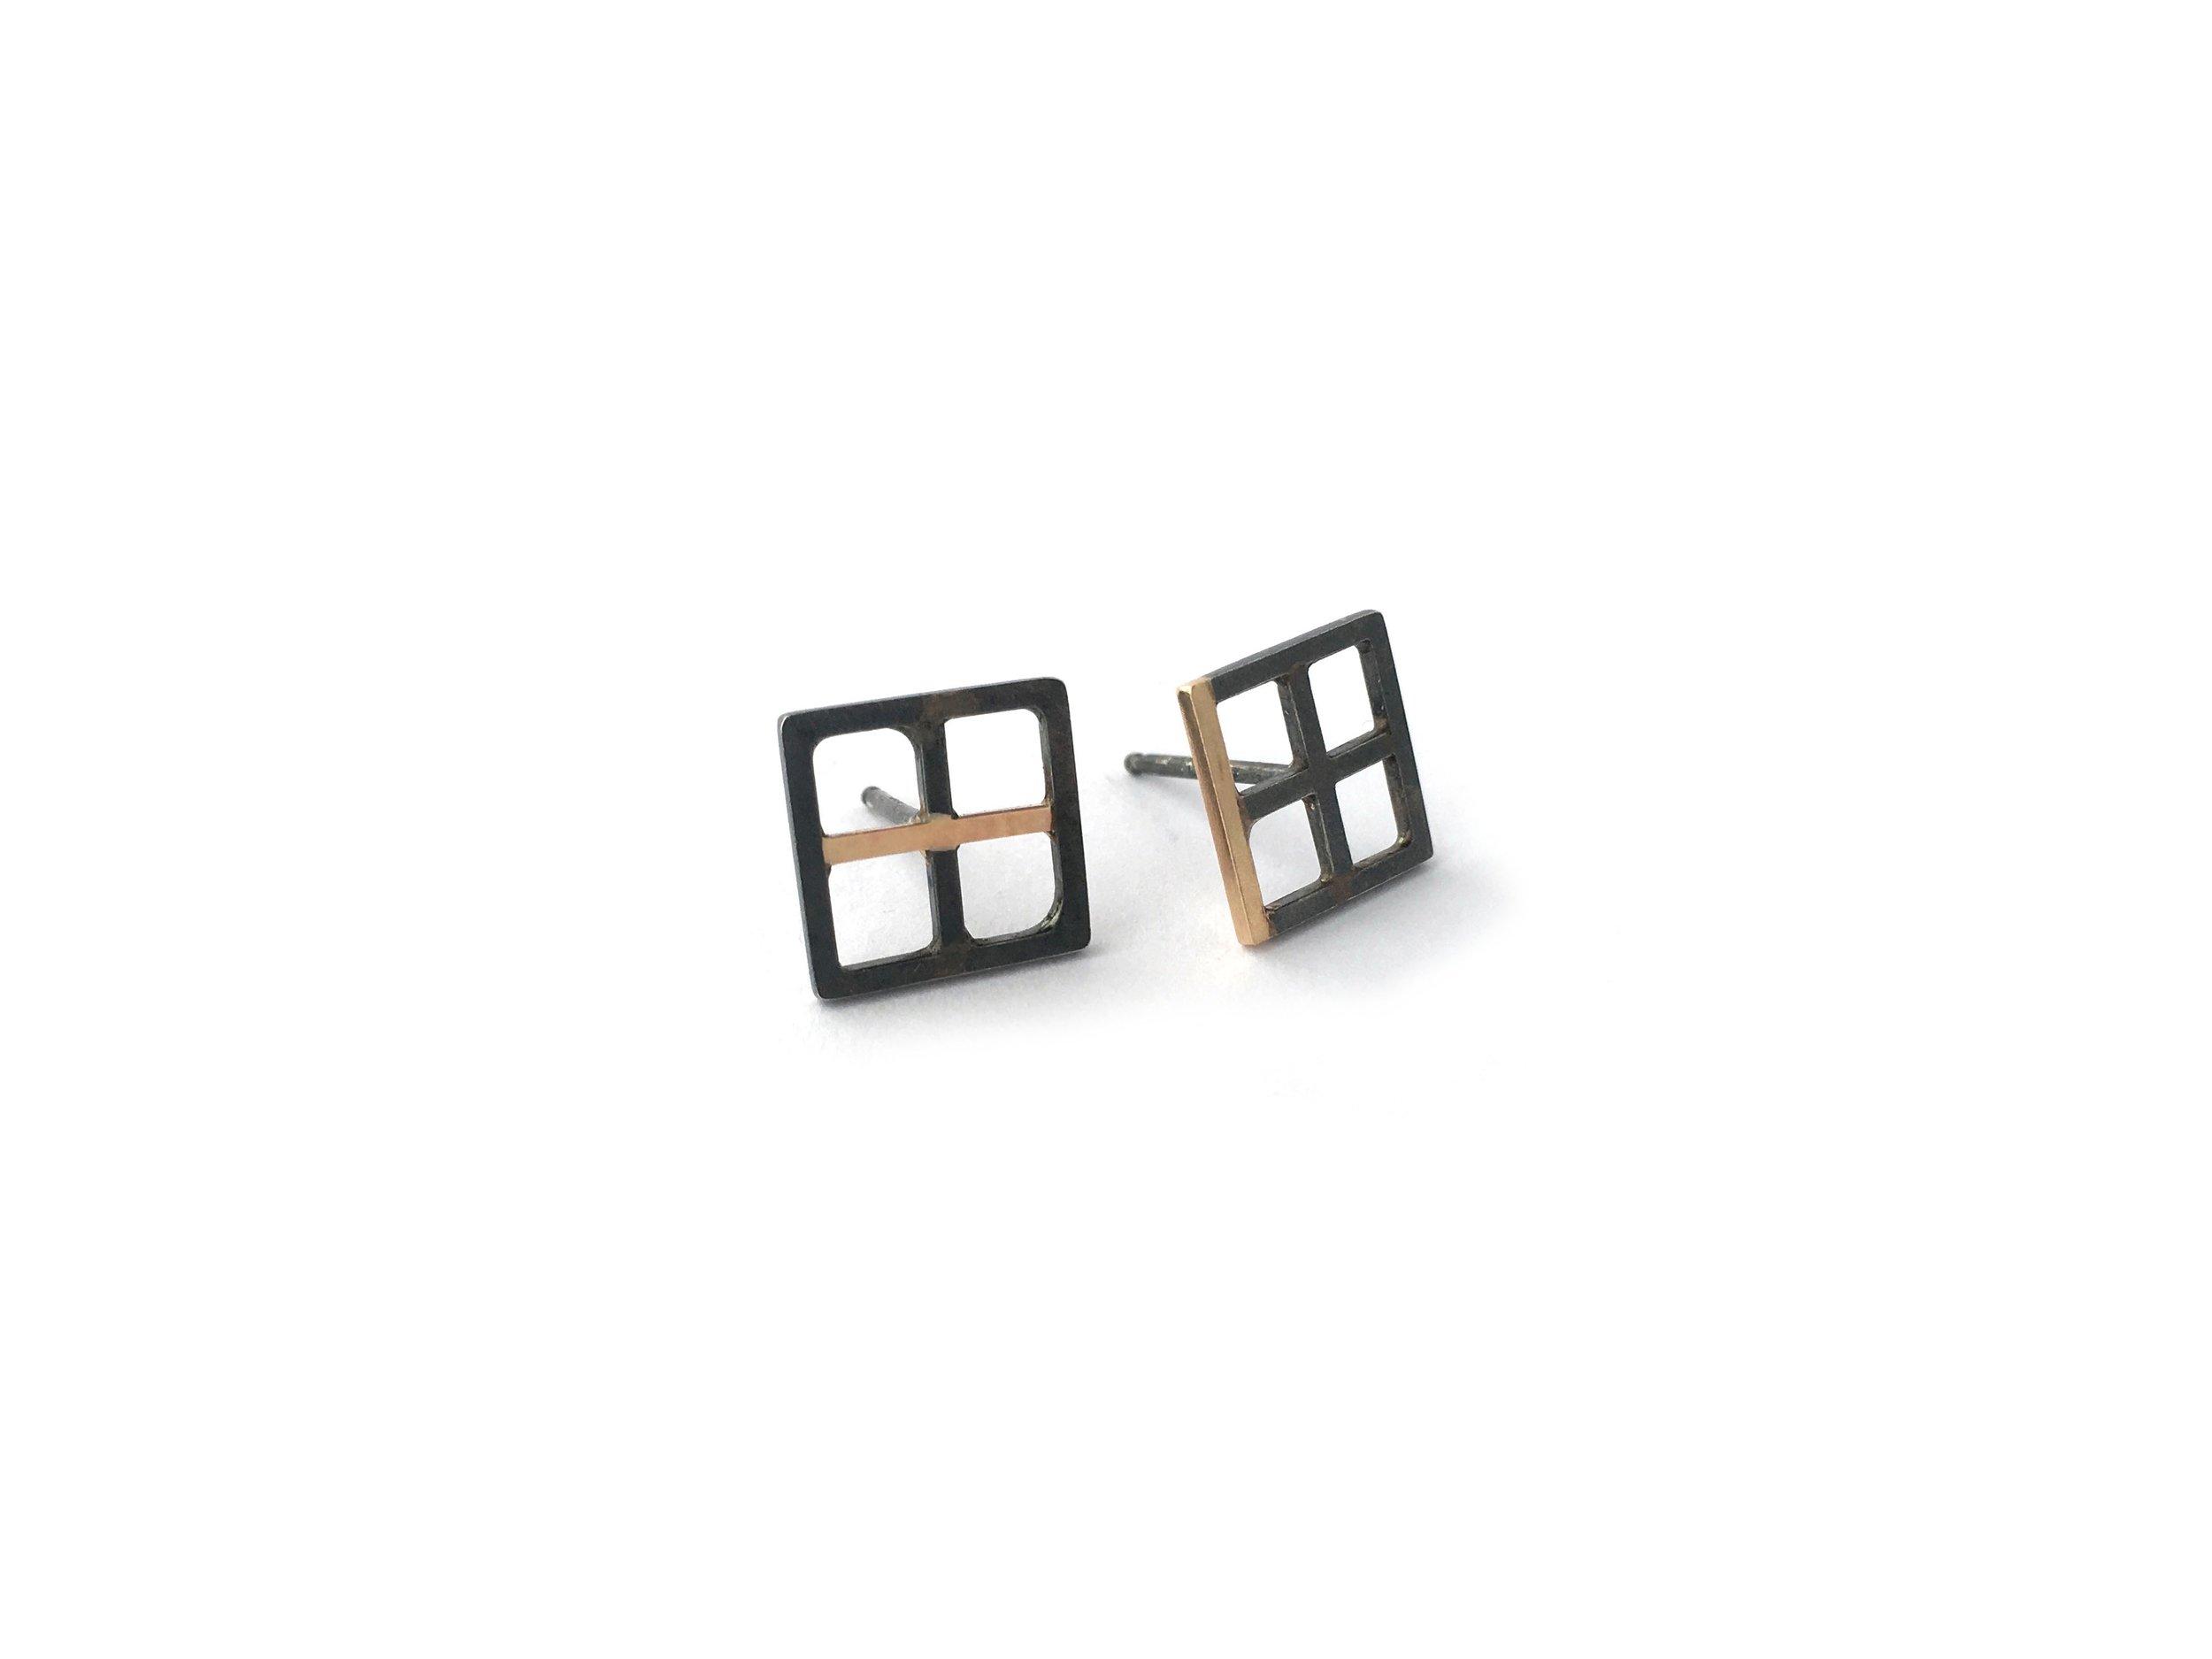 2nd dimension earrings